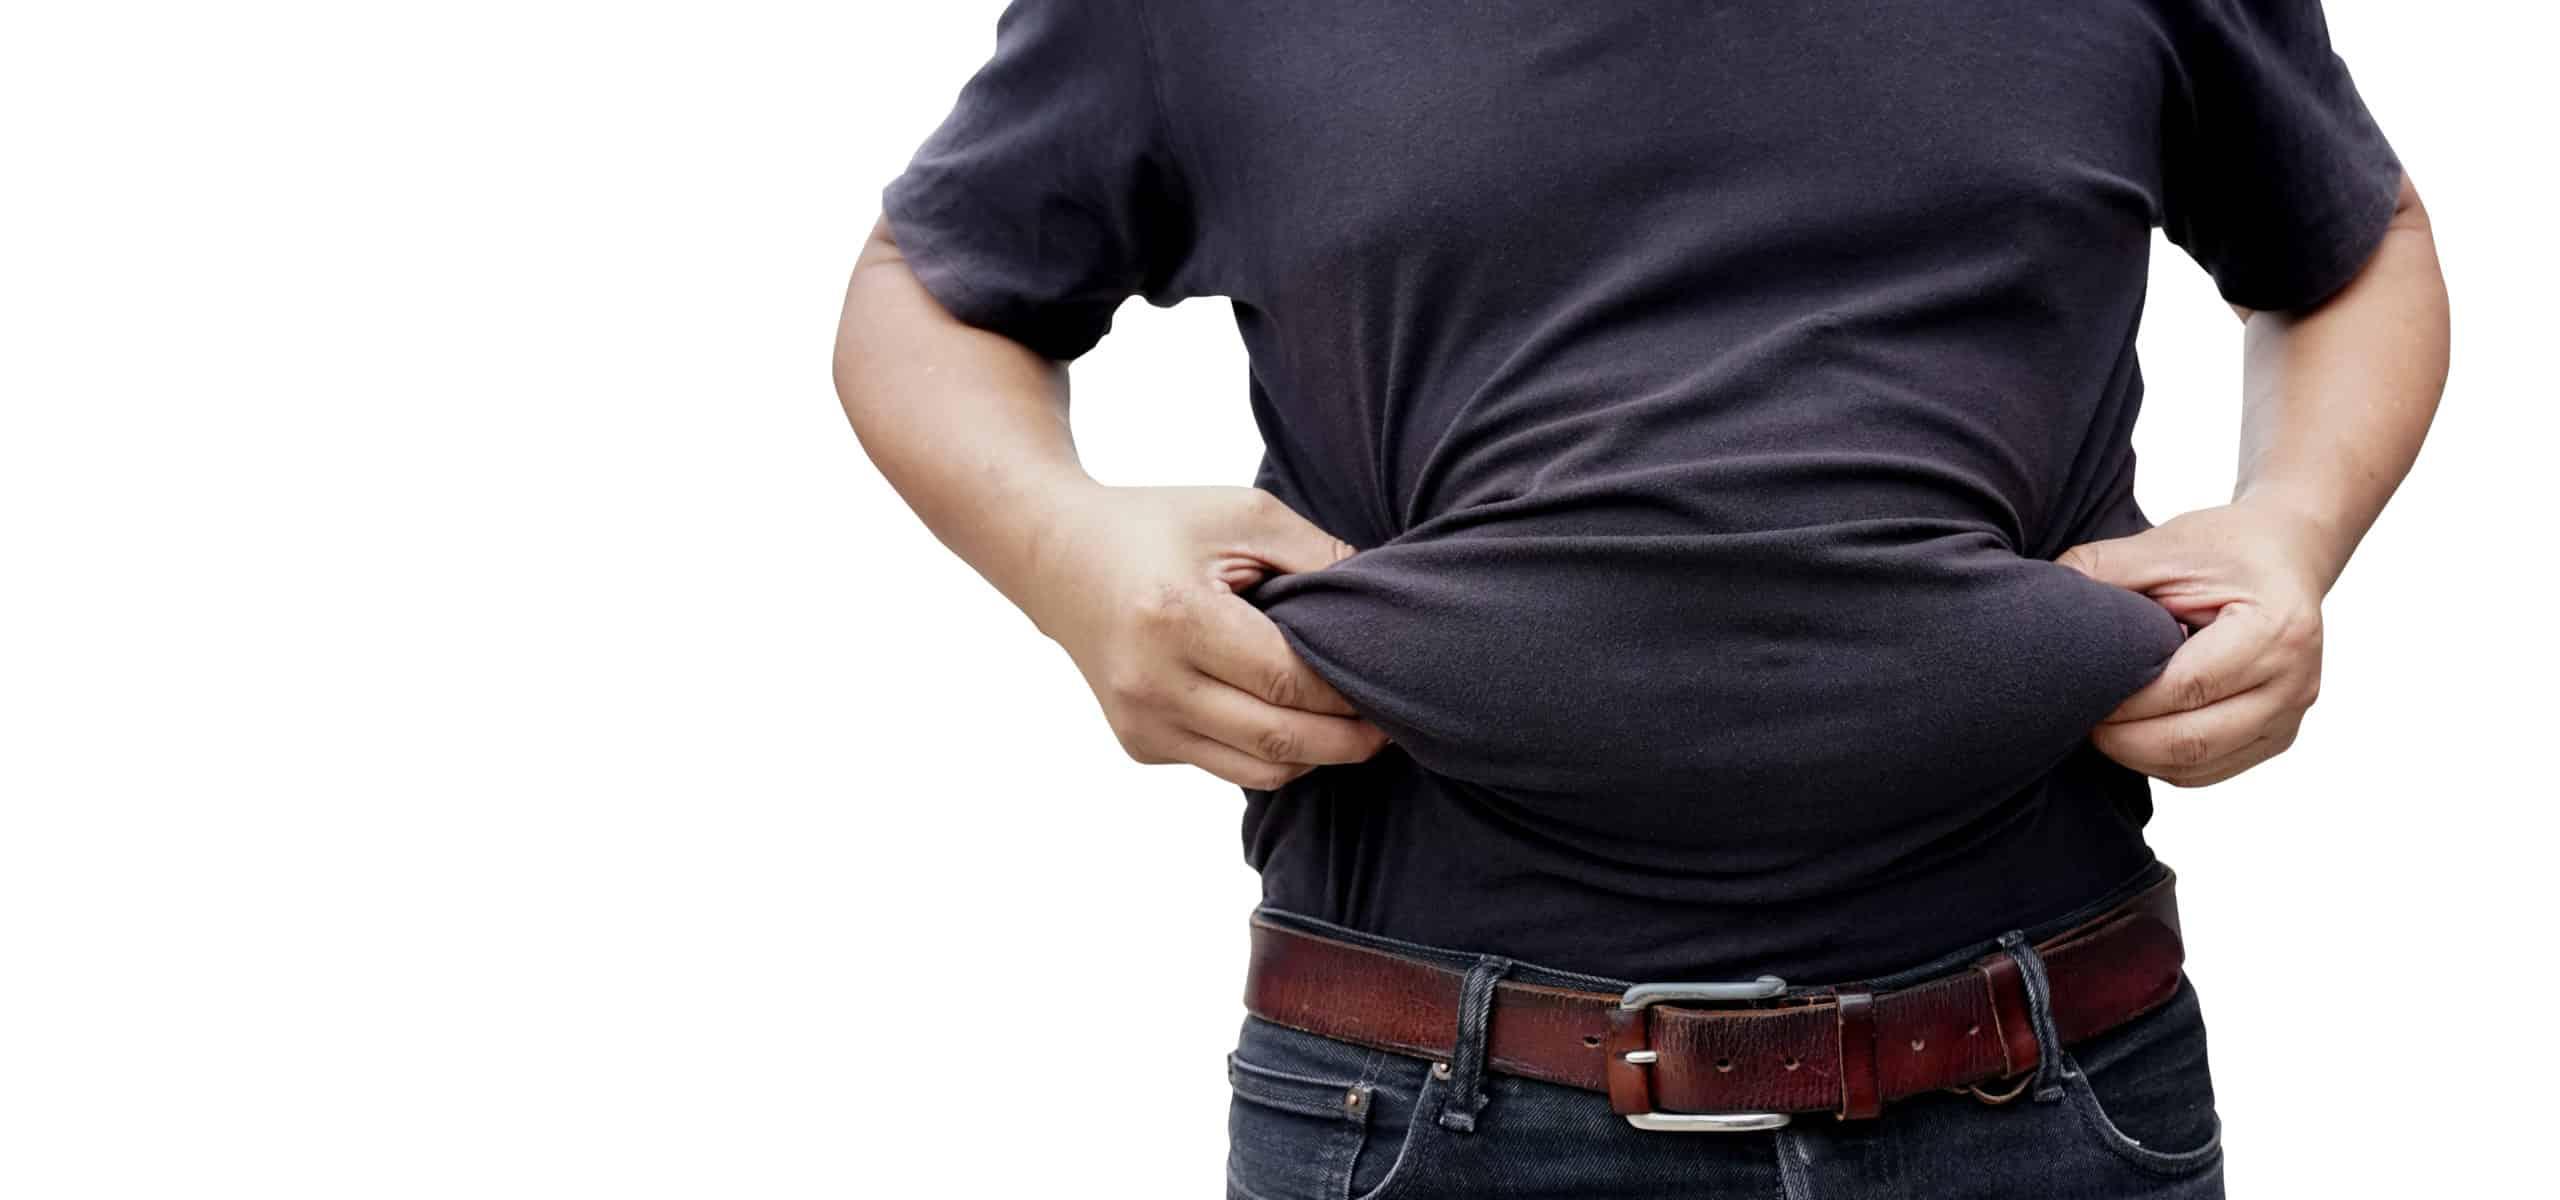 Overweight man in black t shirt grabbing belly fat